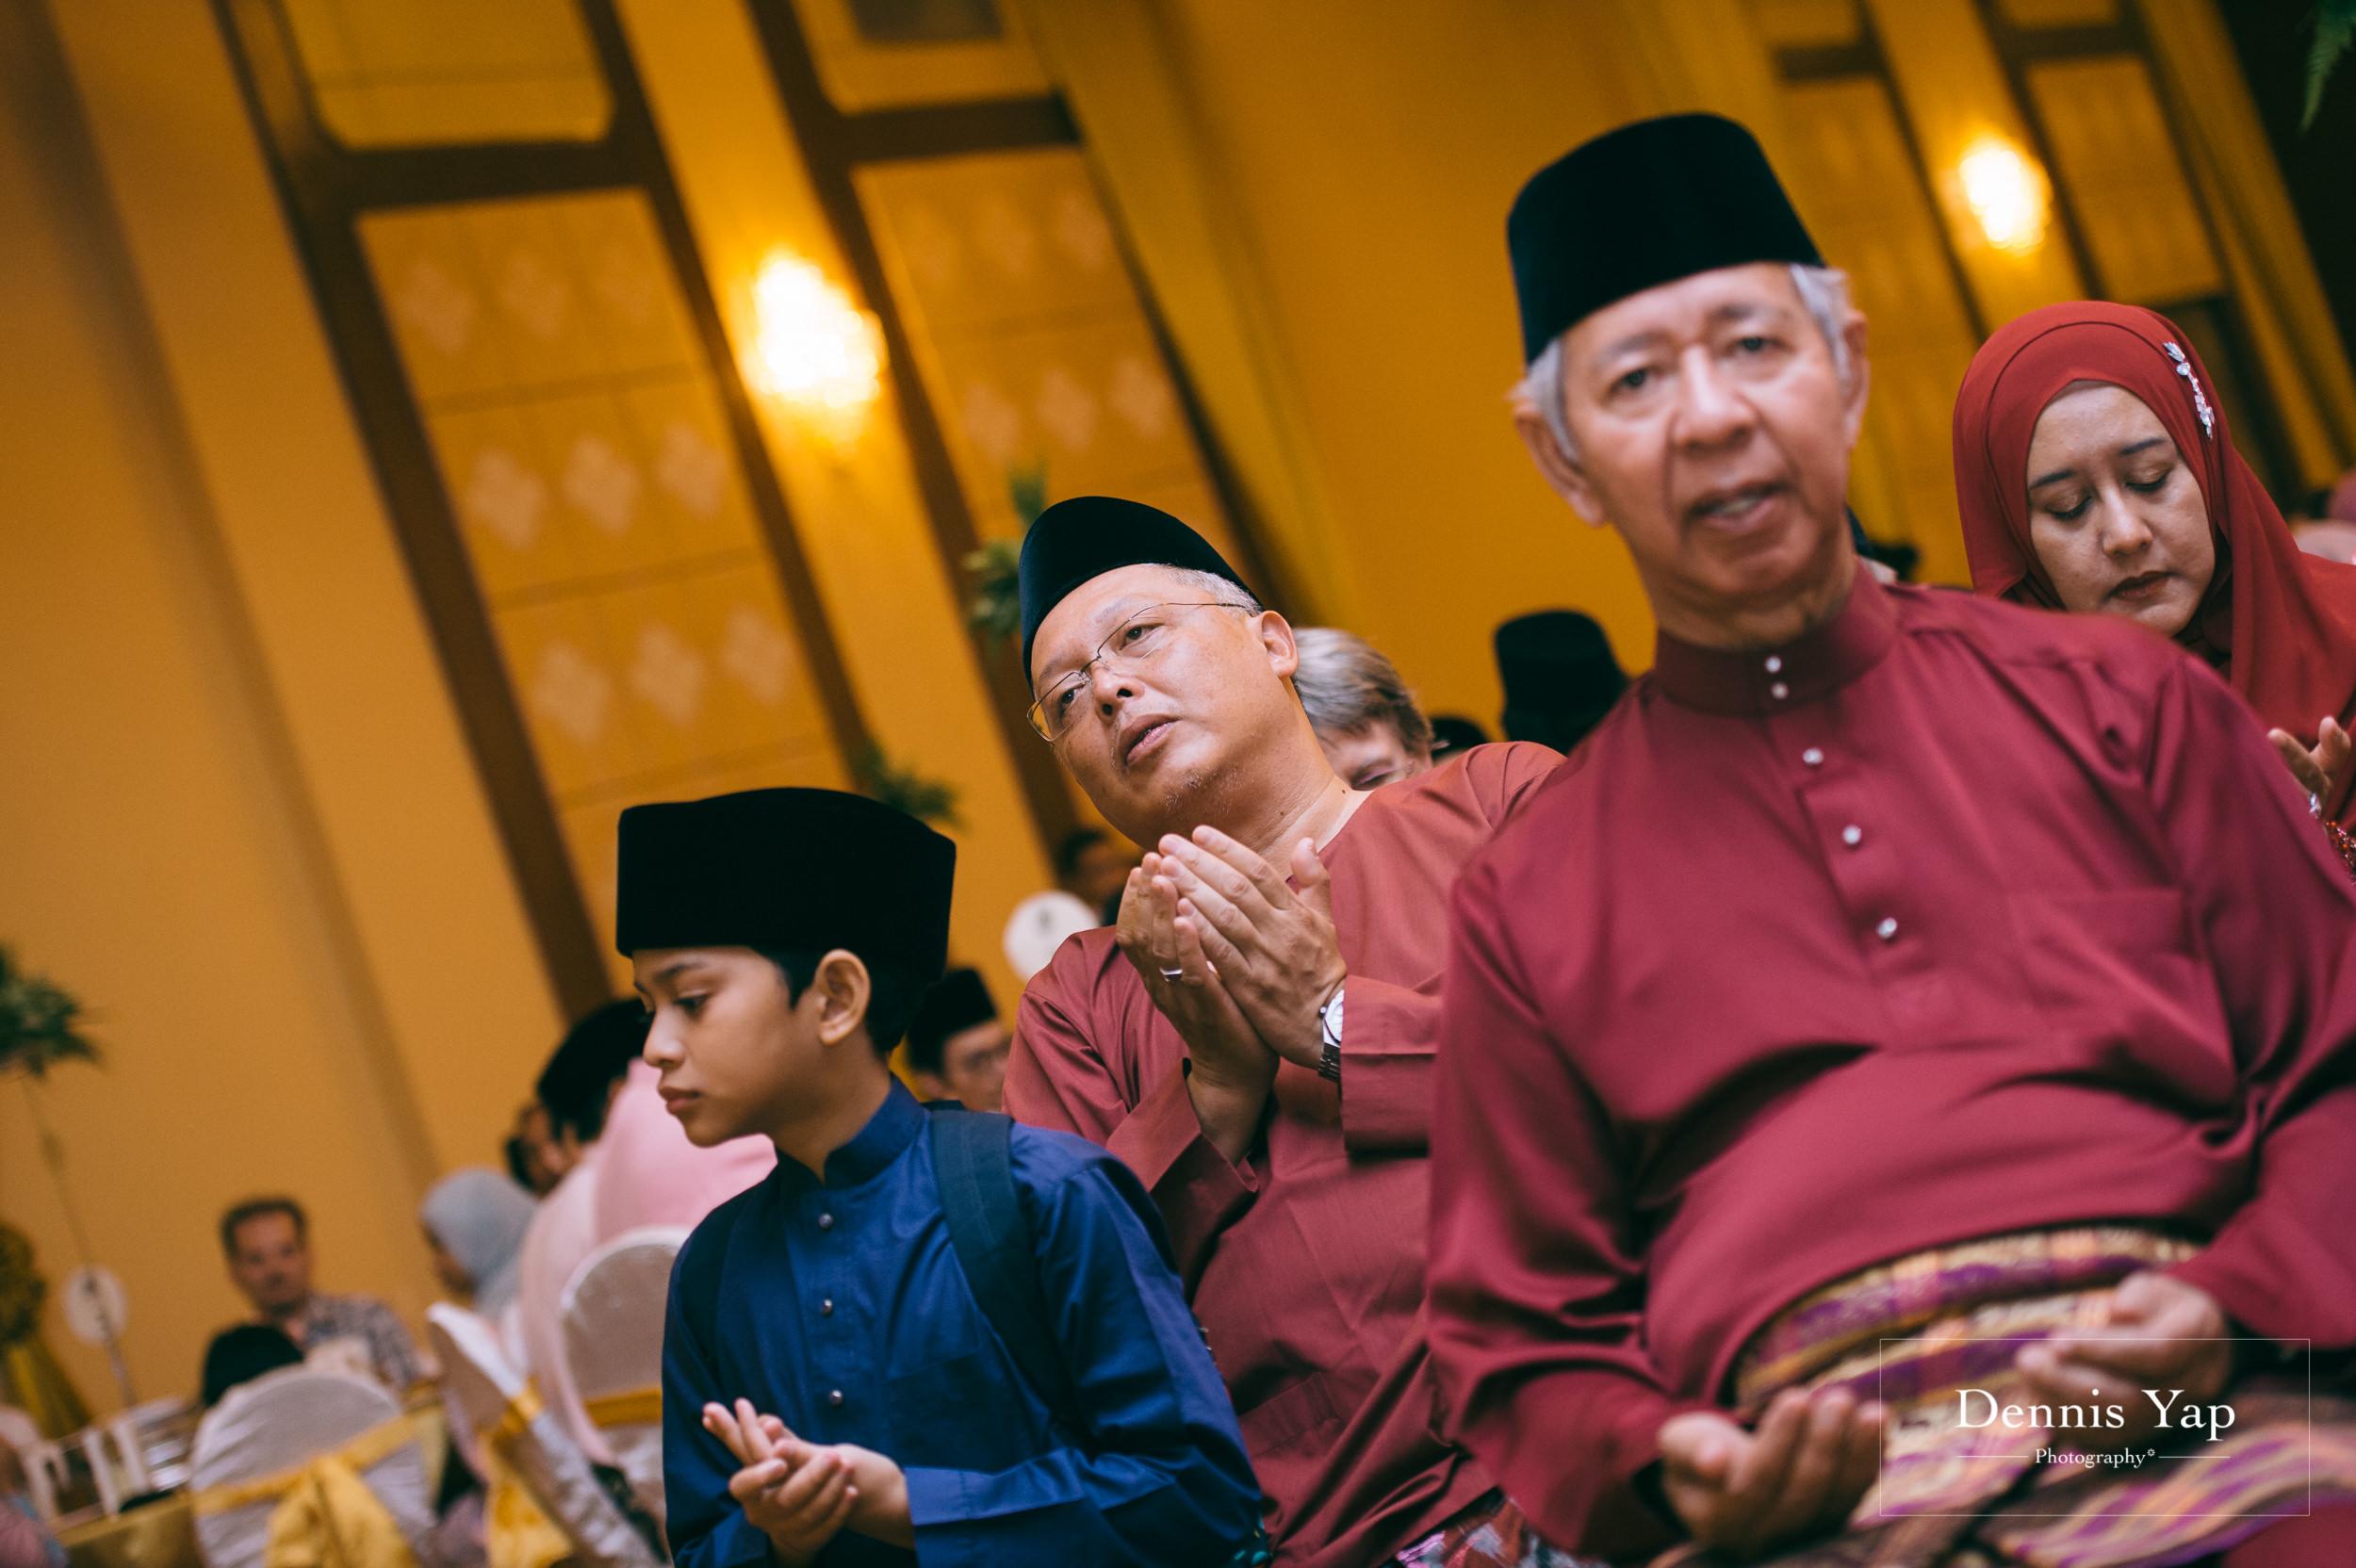 zarif hanalili malay wedding blessing ceremony dennis yap photography-15.jpg